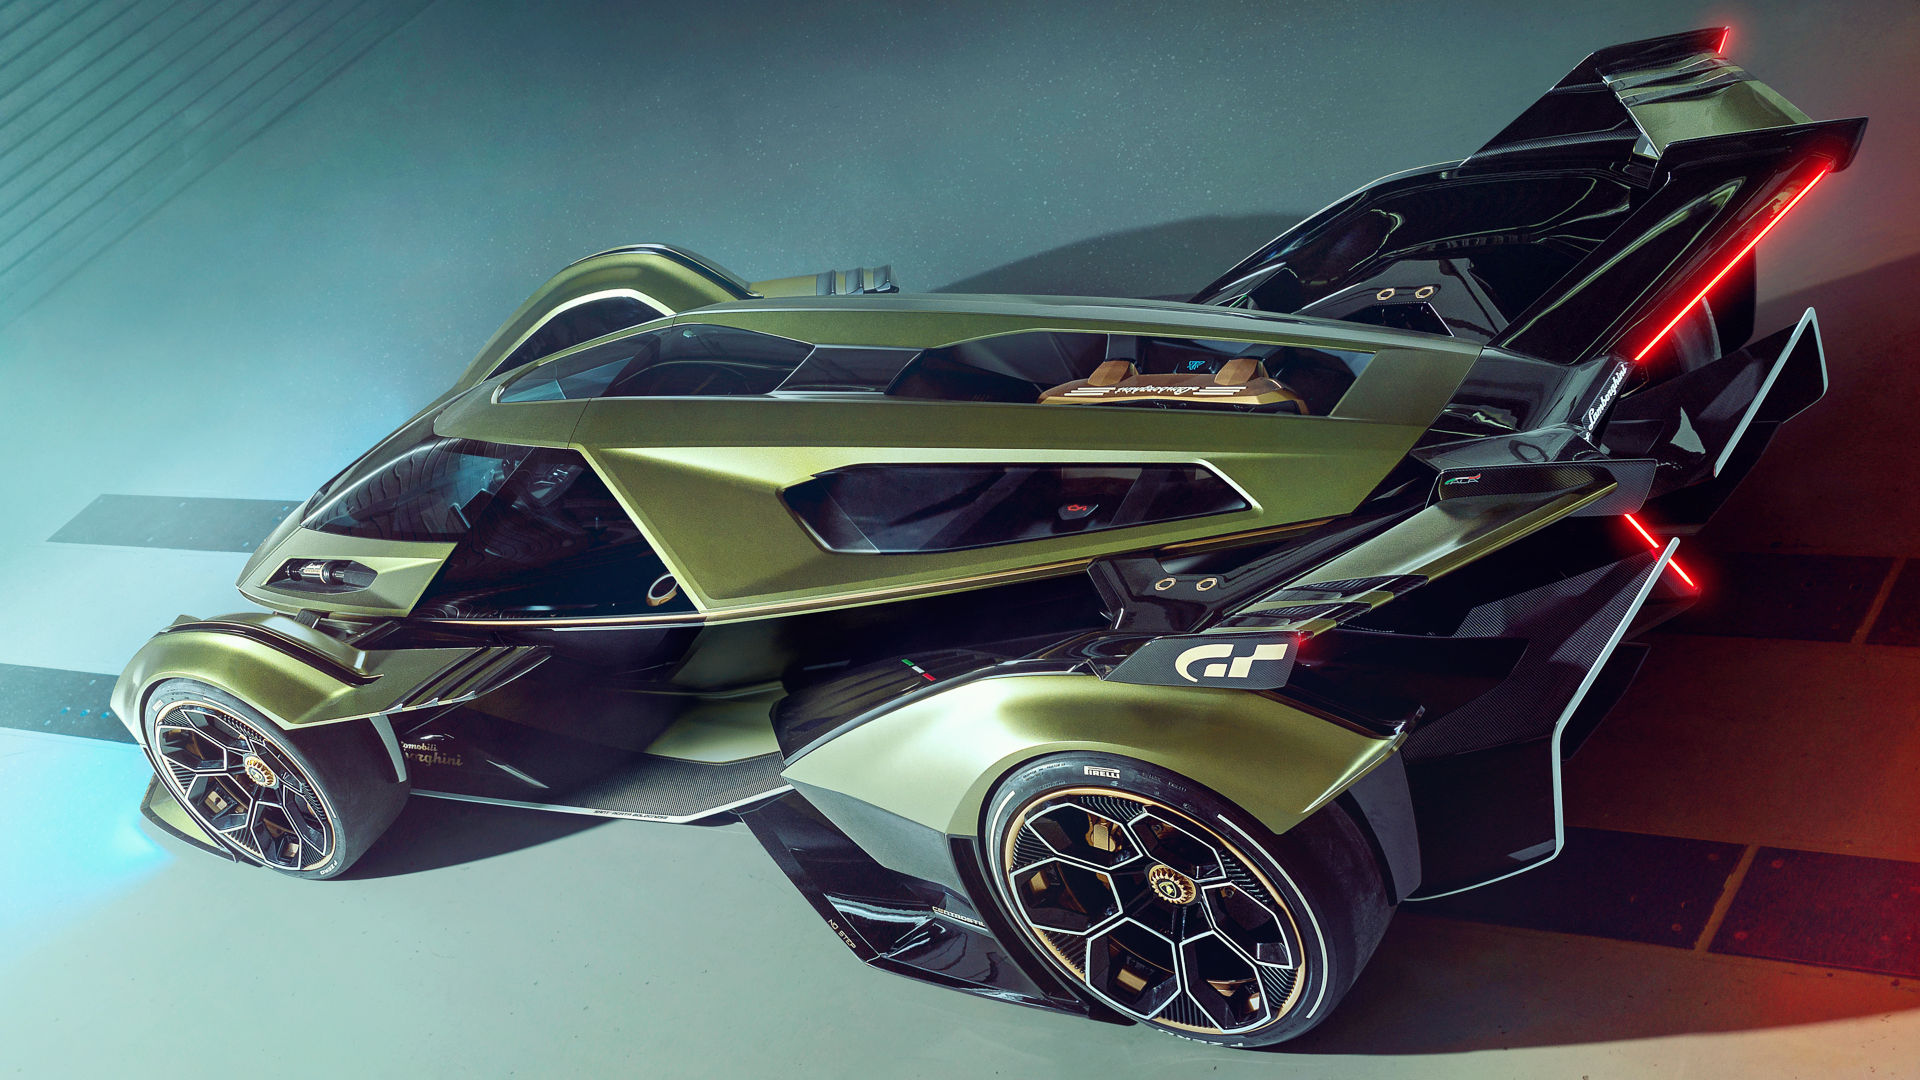 Lamborghini Lambo V12 Vision Gran Turismo Wallpaper